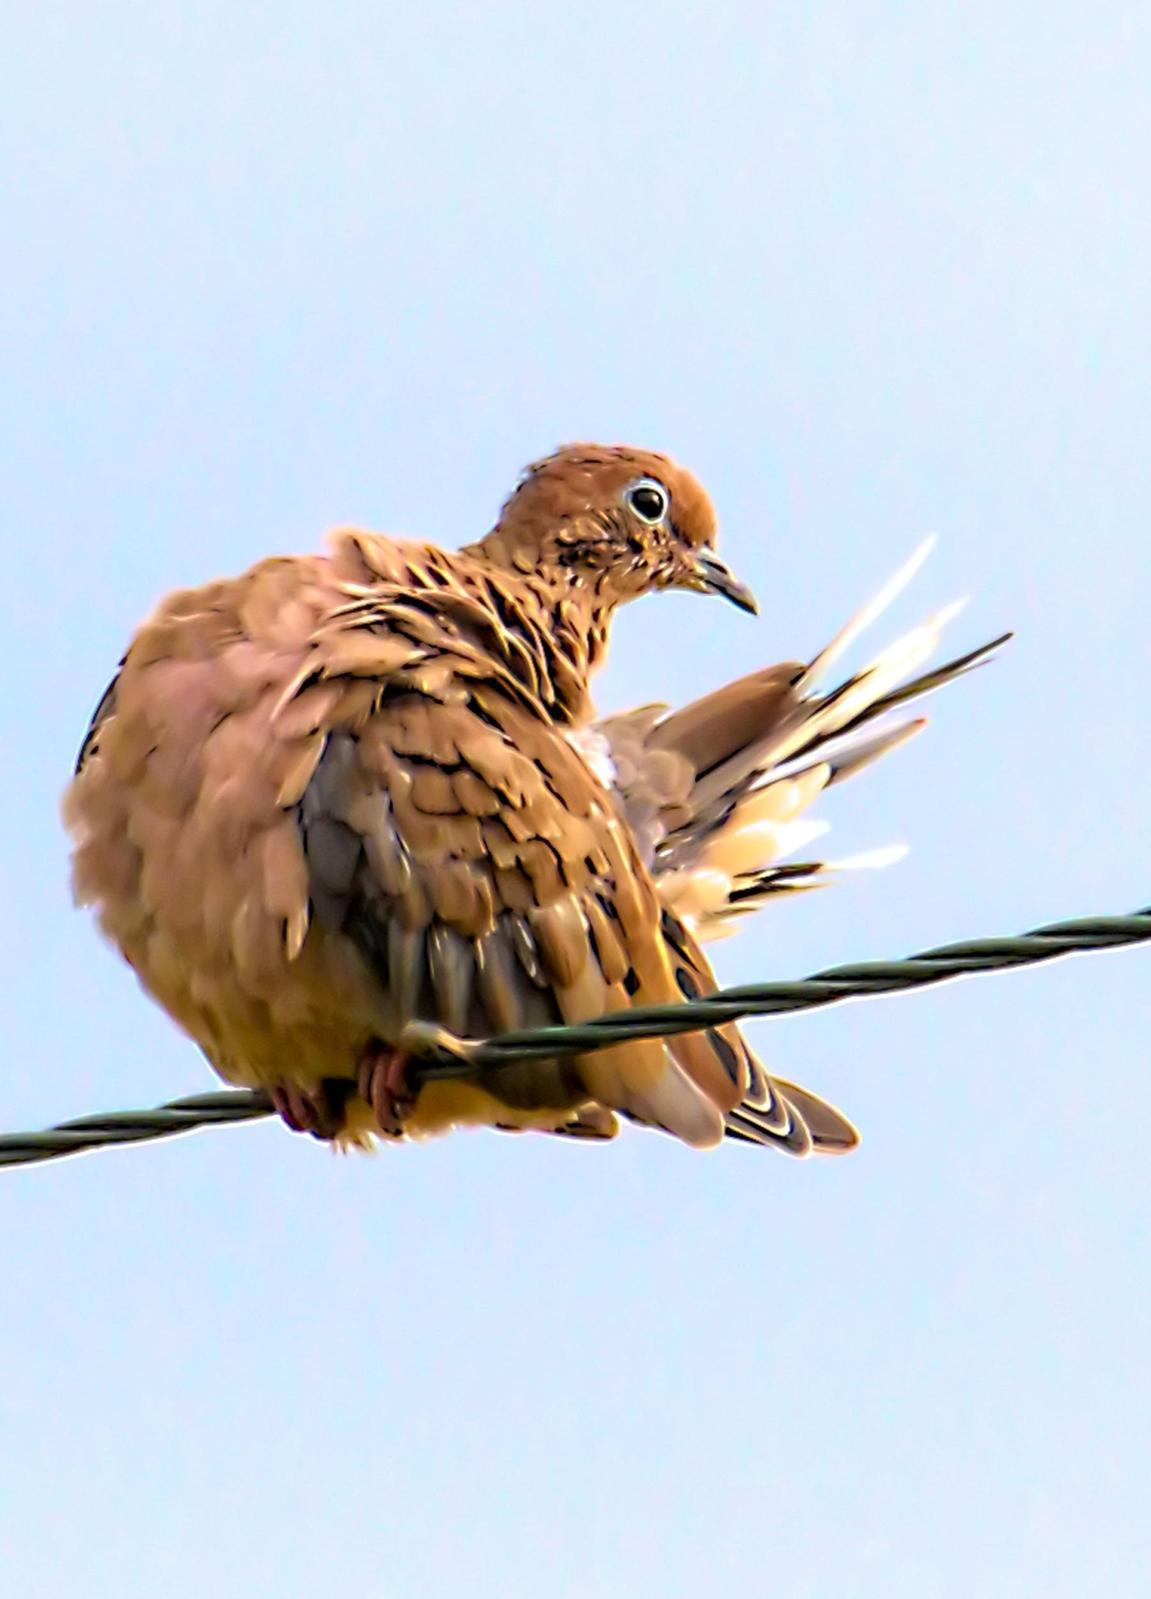 Mourning Dove Photo by Dan Tallman